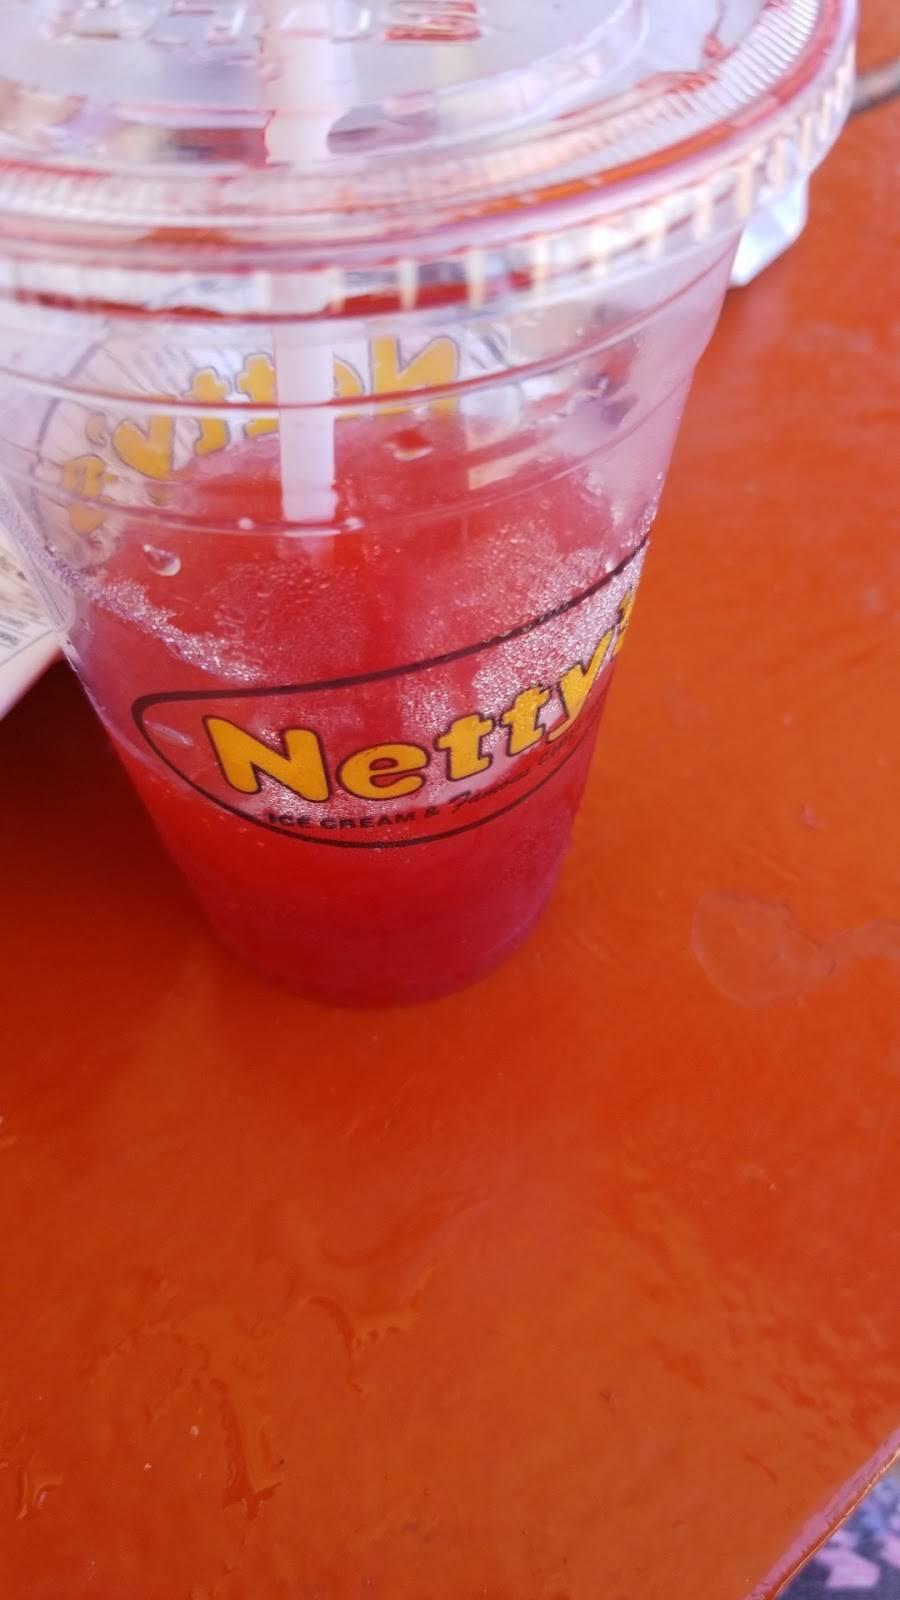 Nettys - restaurant  | Photo 6 of 9 | Address: 325 S Fearing Blvd, Toledo, OH 43609, USA | Phone: (419) 214-0774